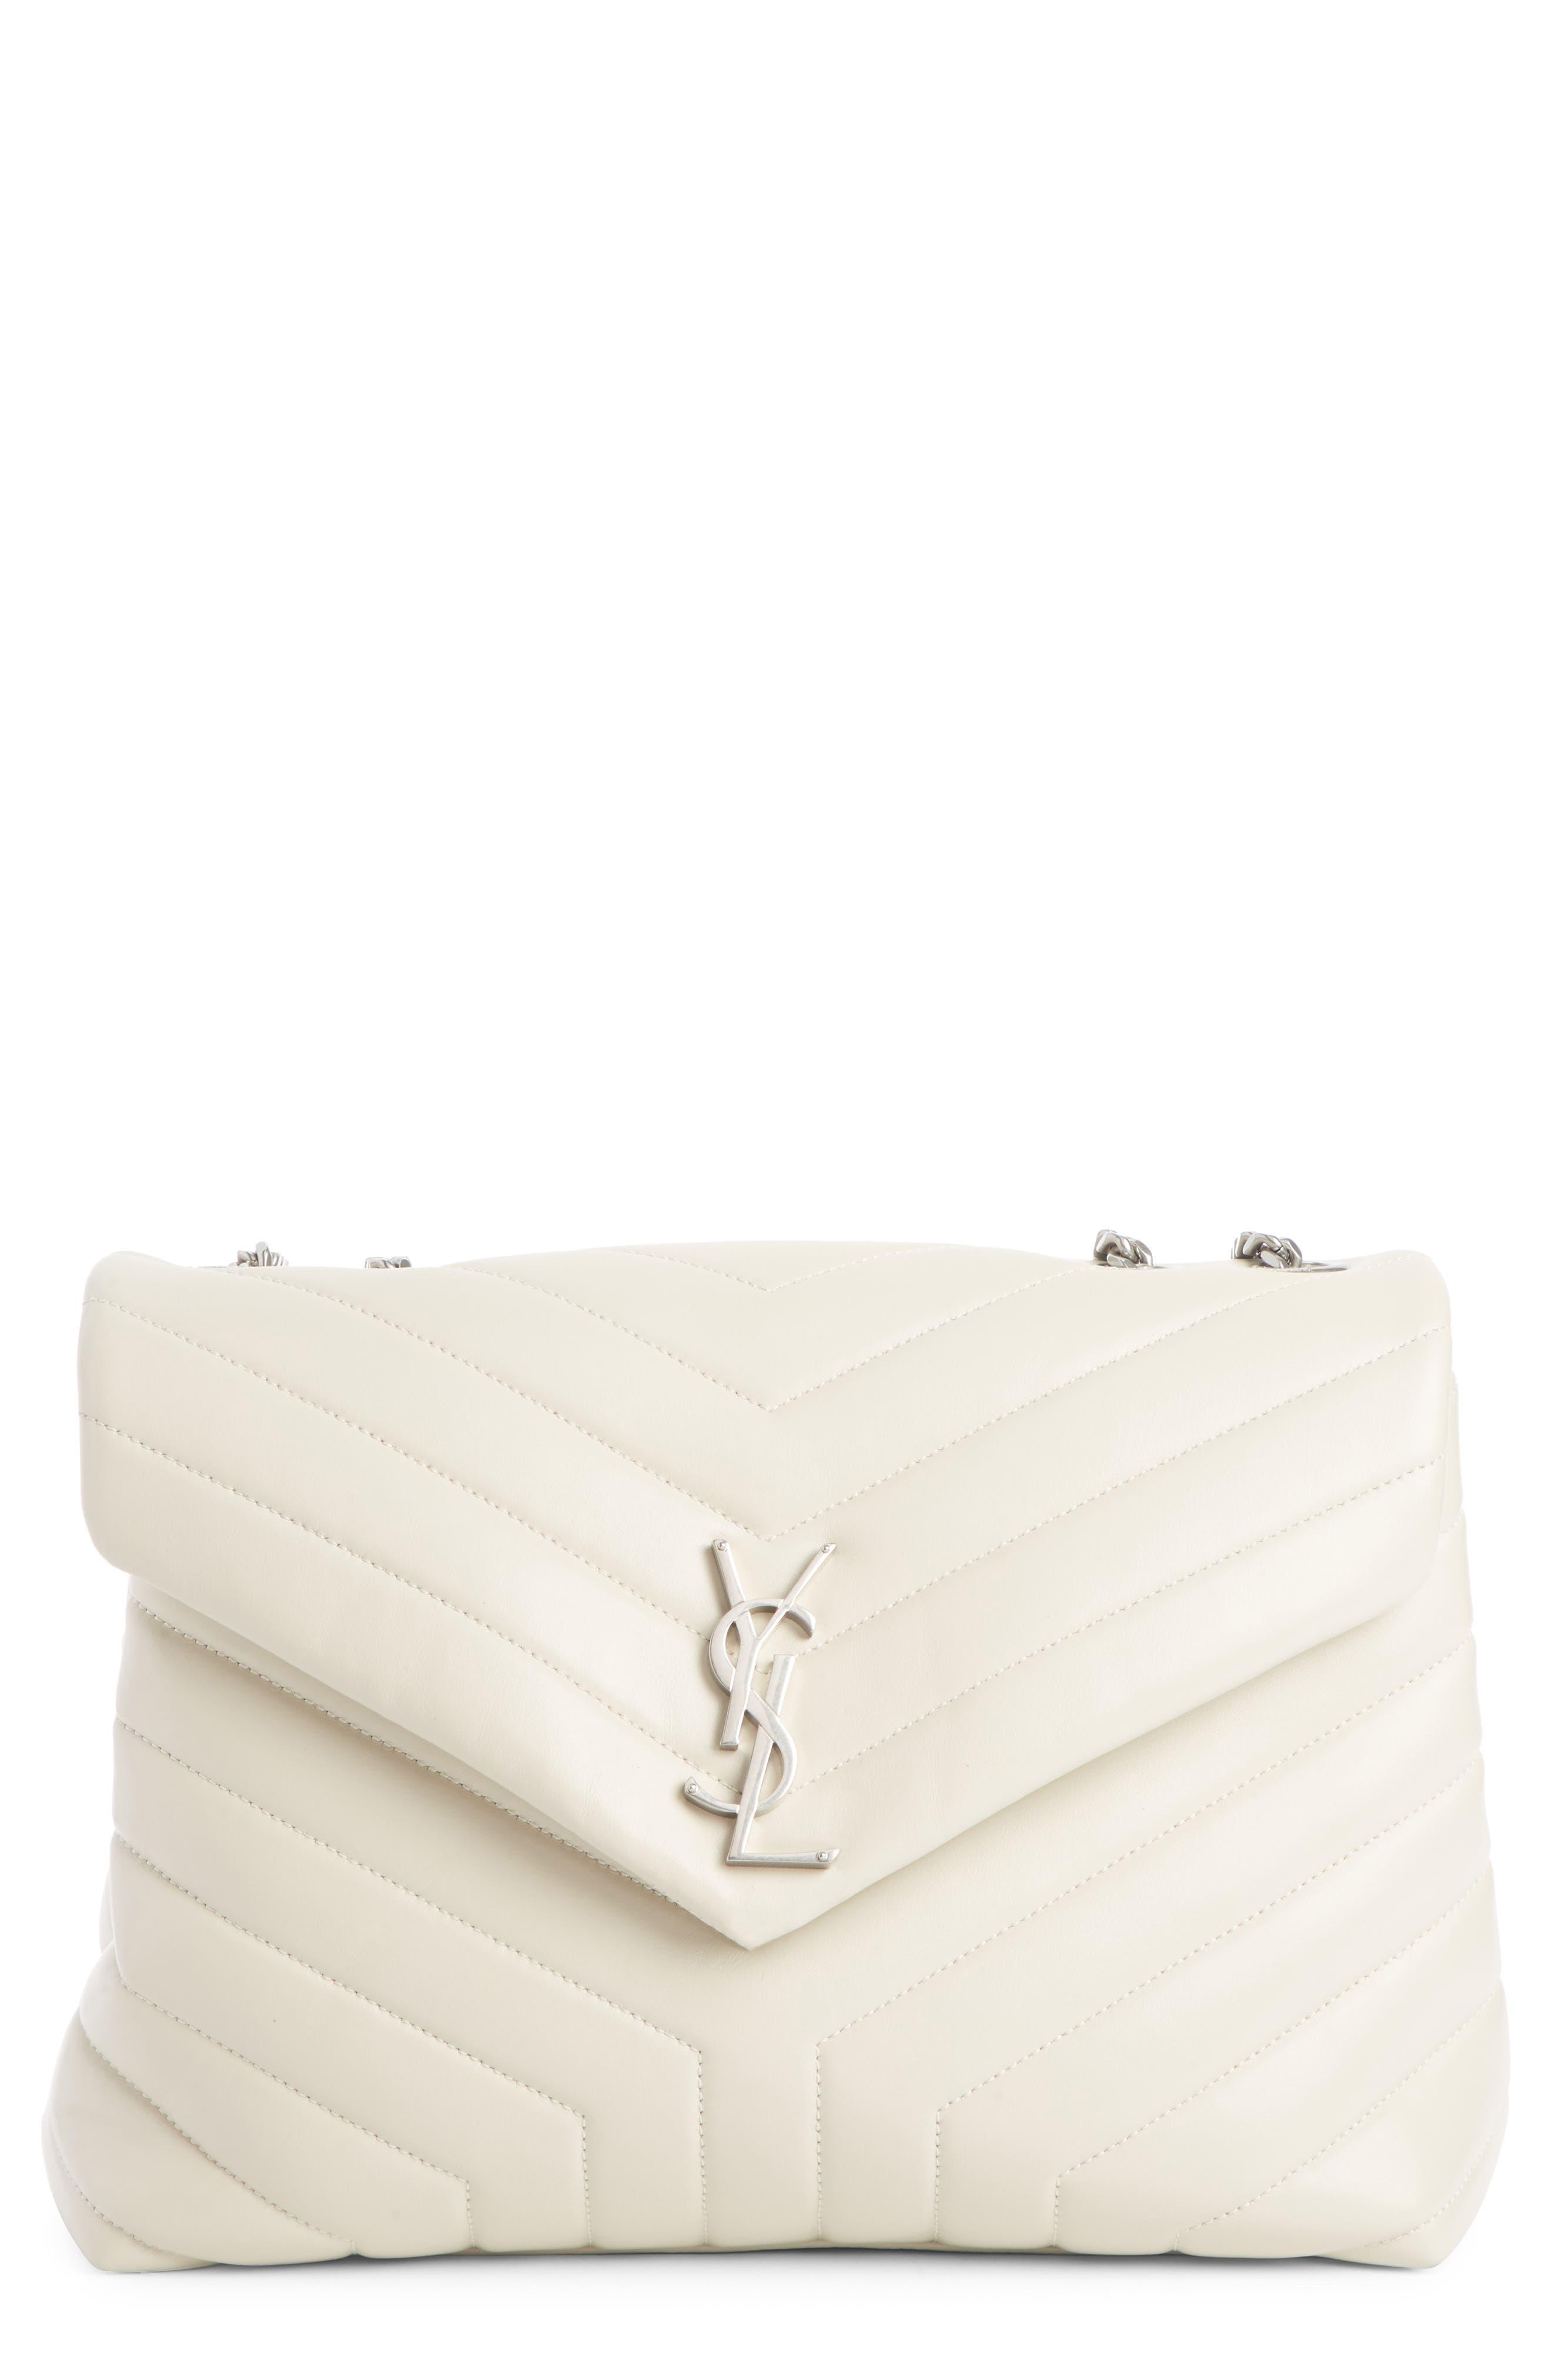 SAINT LAURENT, Medium Loulou Calfskin Leather Shoulder Bag, Main thumbnail 1, color, CREMA SOFT/ CREMA SOFT